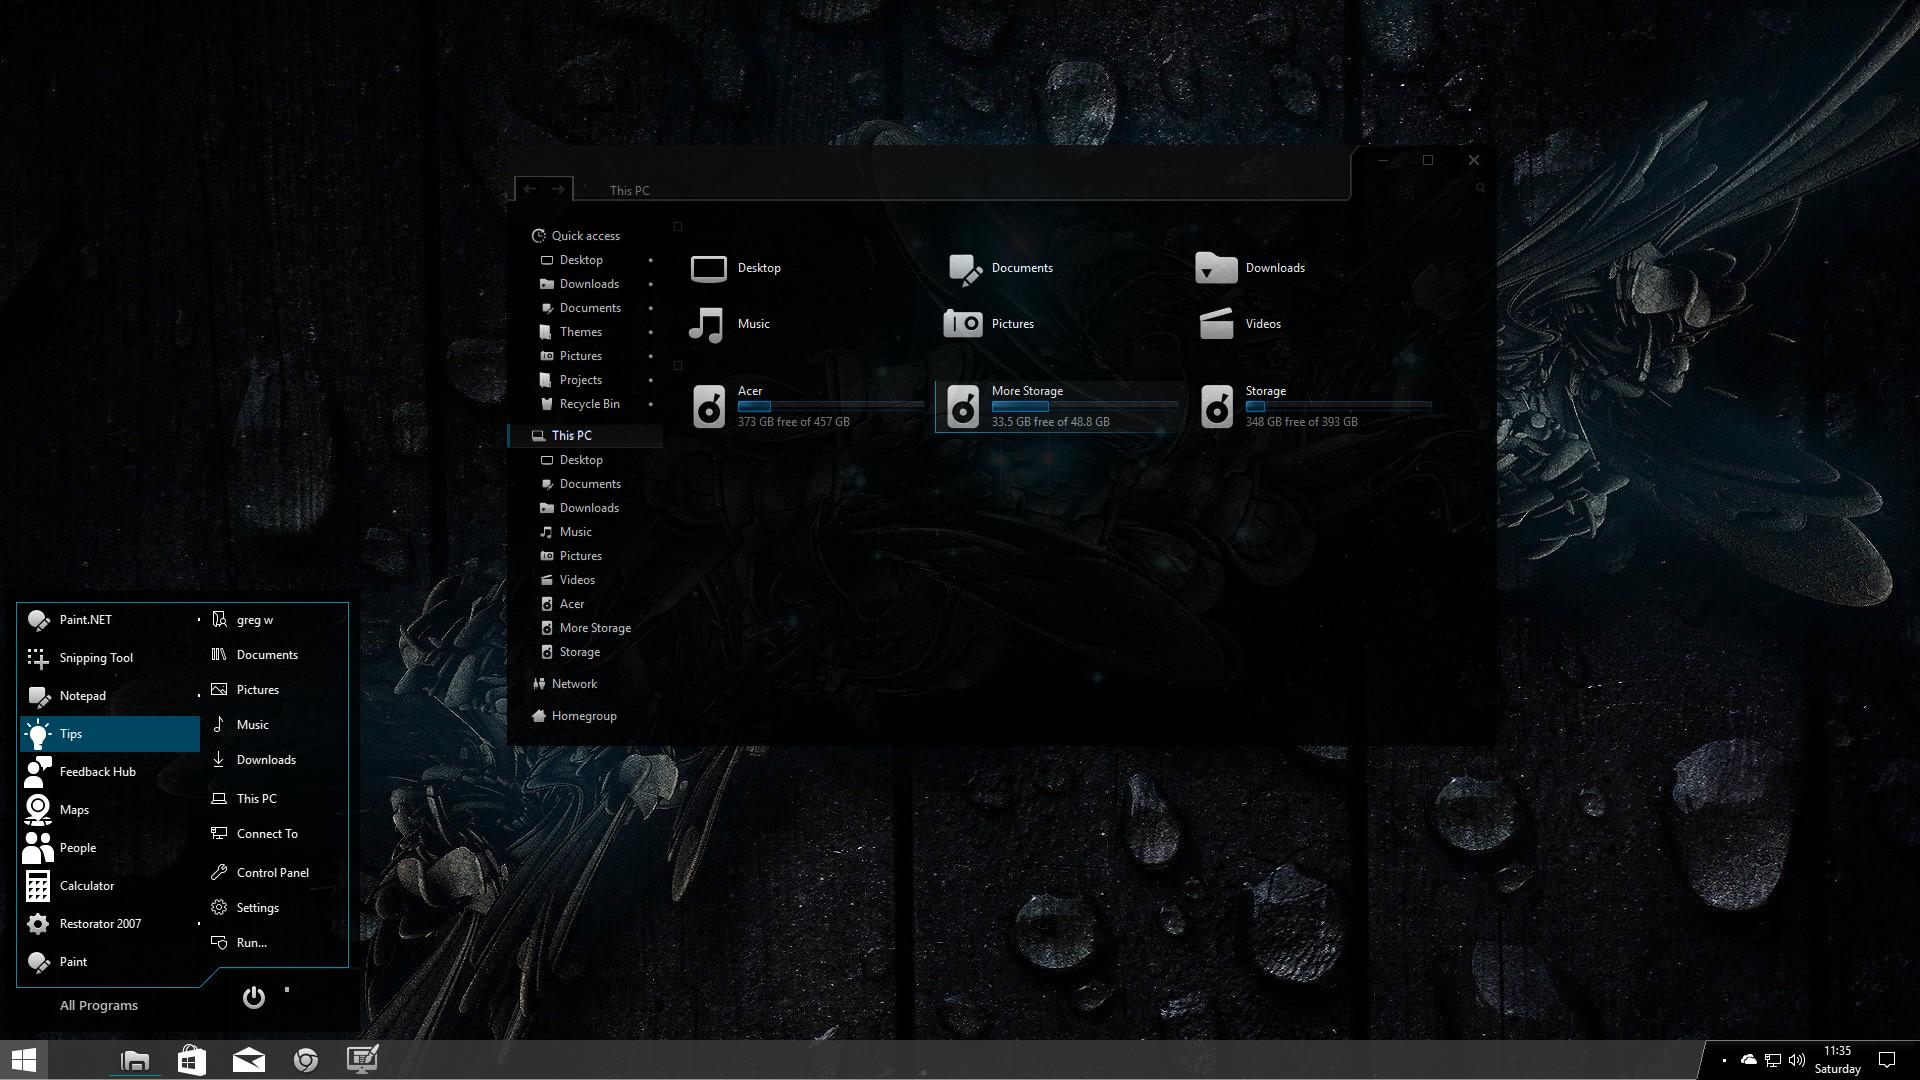 DMG-SiB for Windows 10 Build 1903-21h2